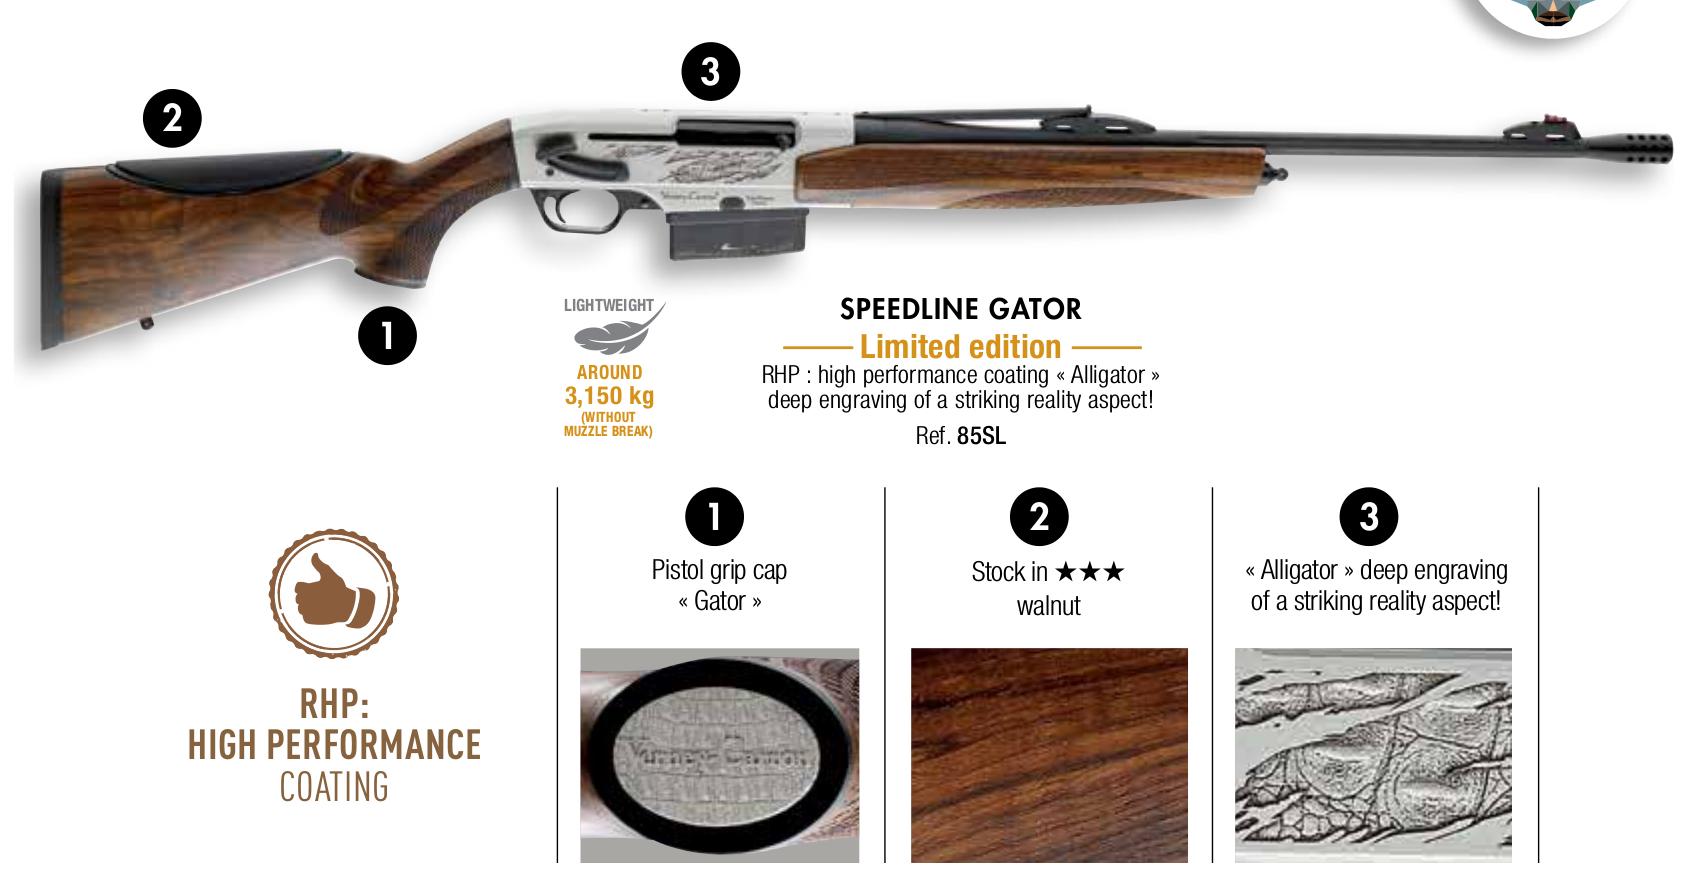 Verney-Carron Speedline Gator limited production rifle